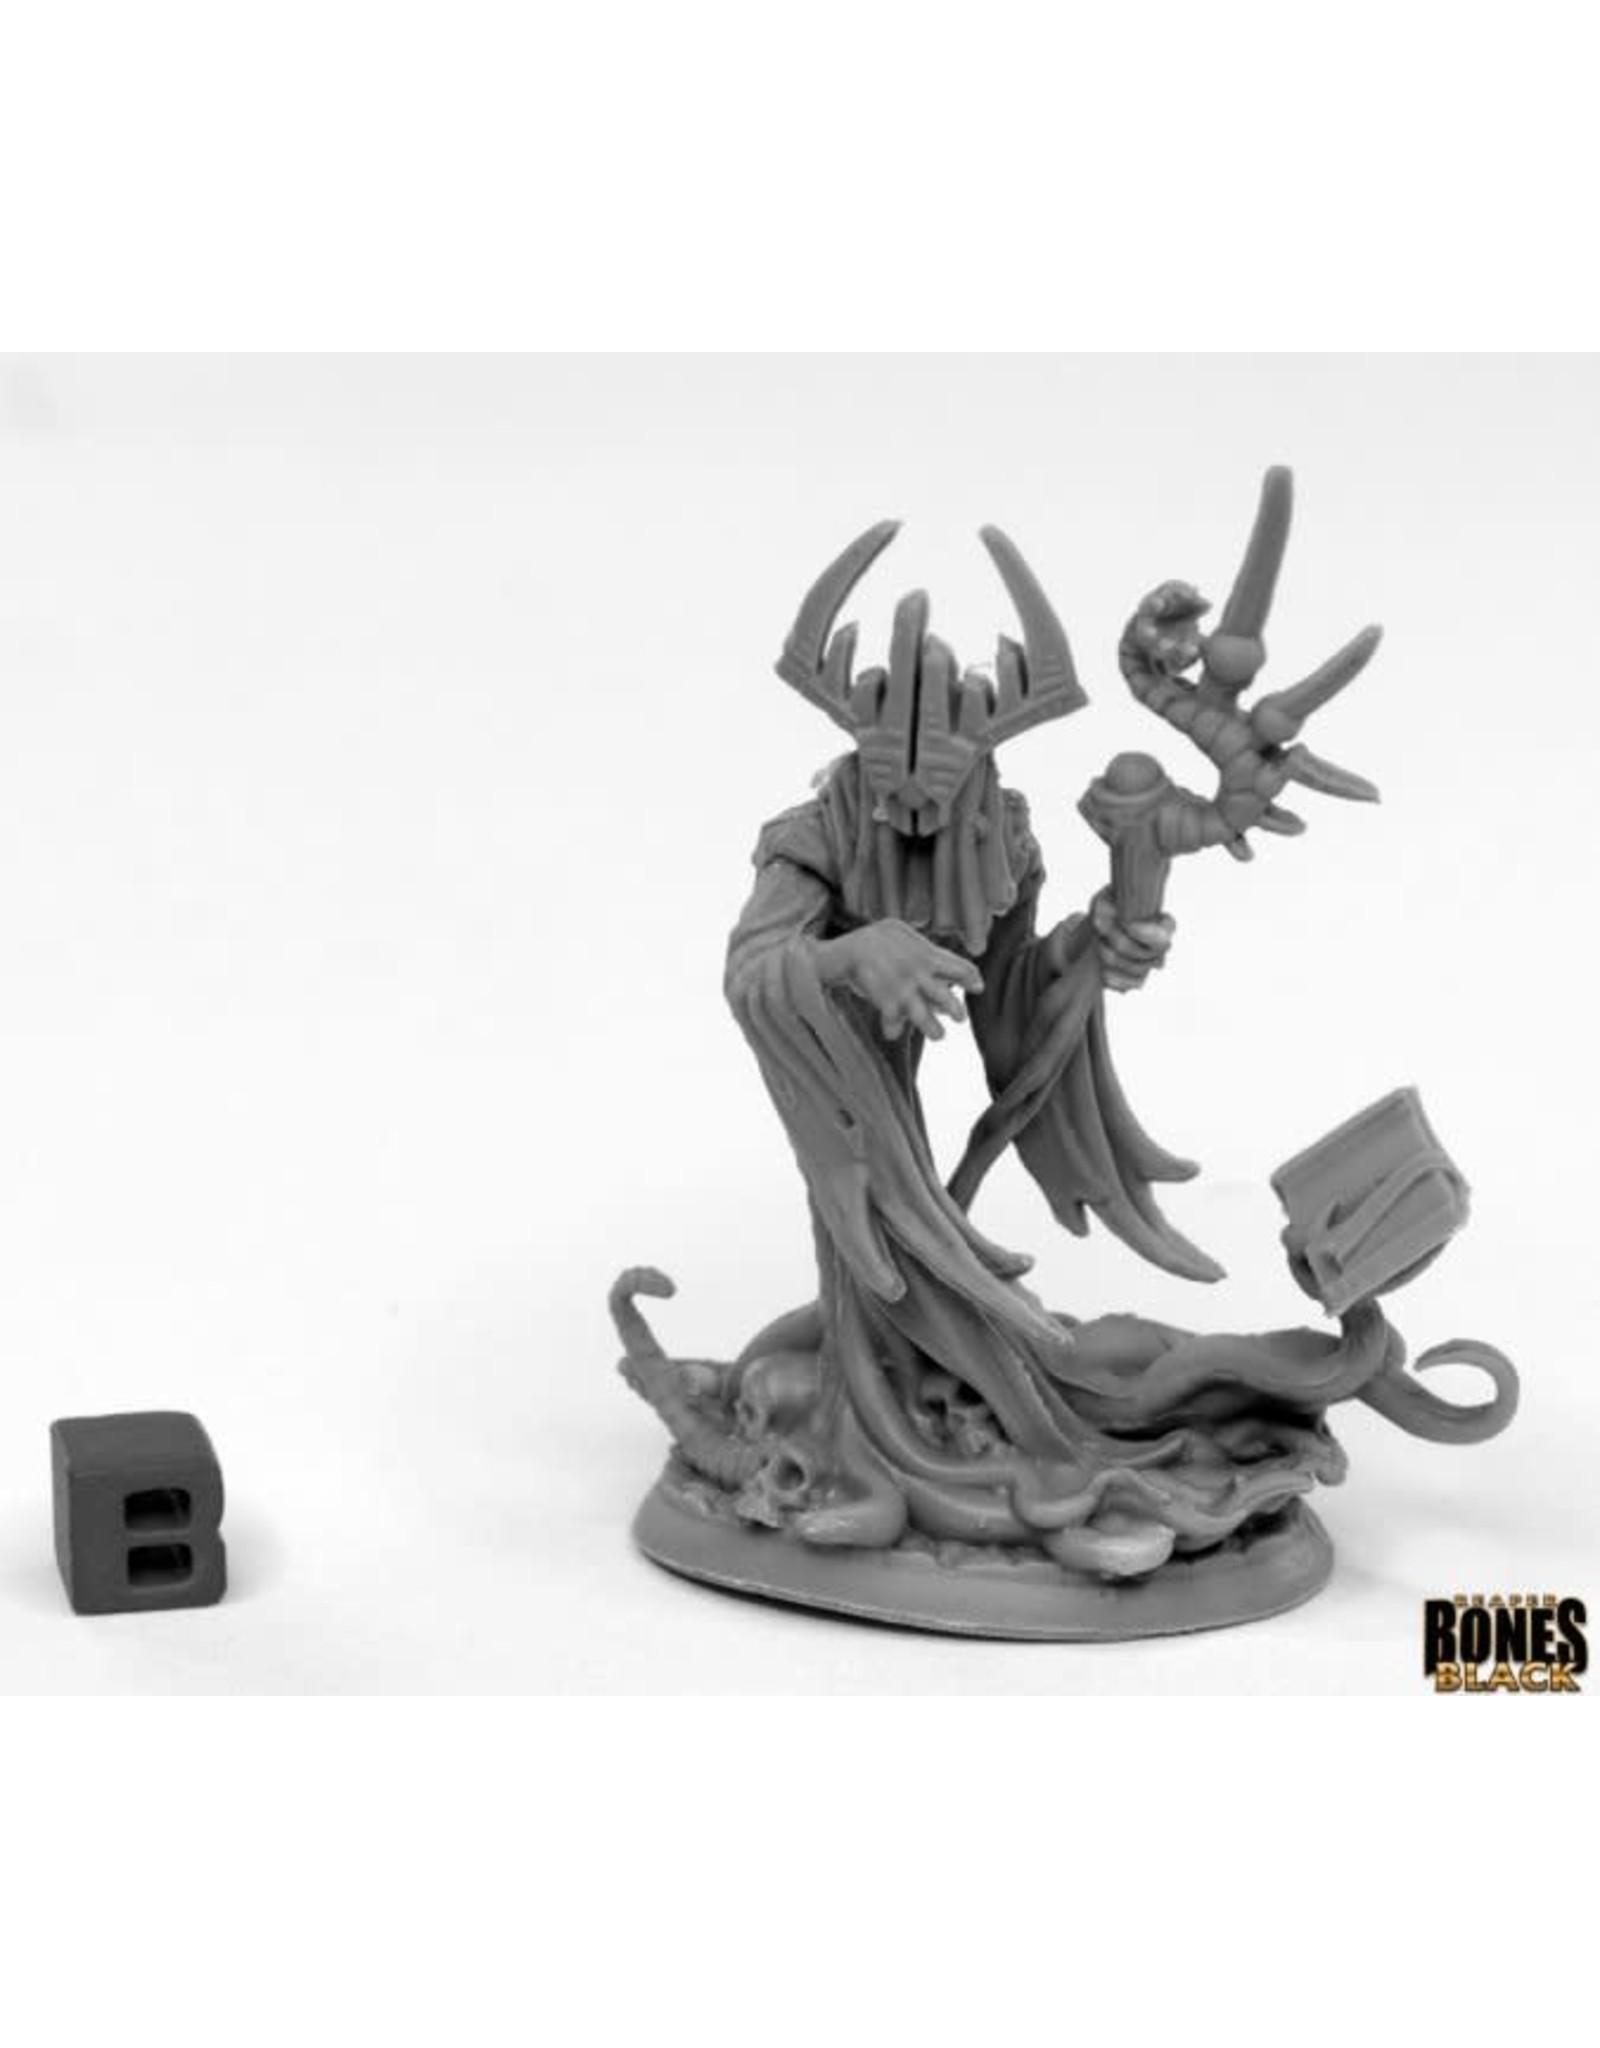 Reaper Miniatures Bones Black: Crimson Herald